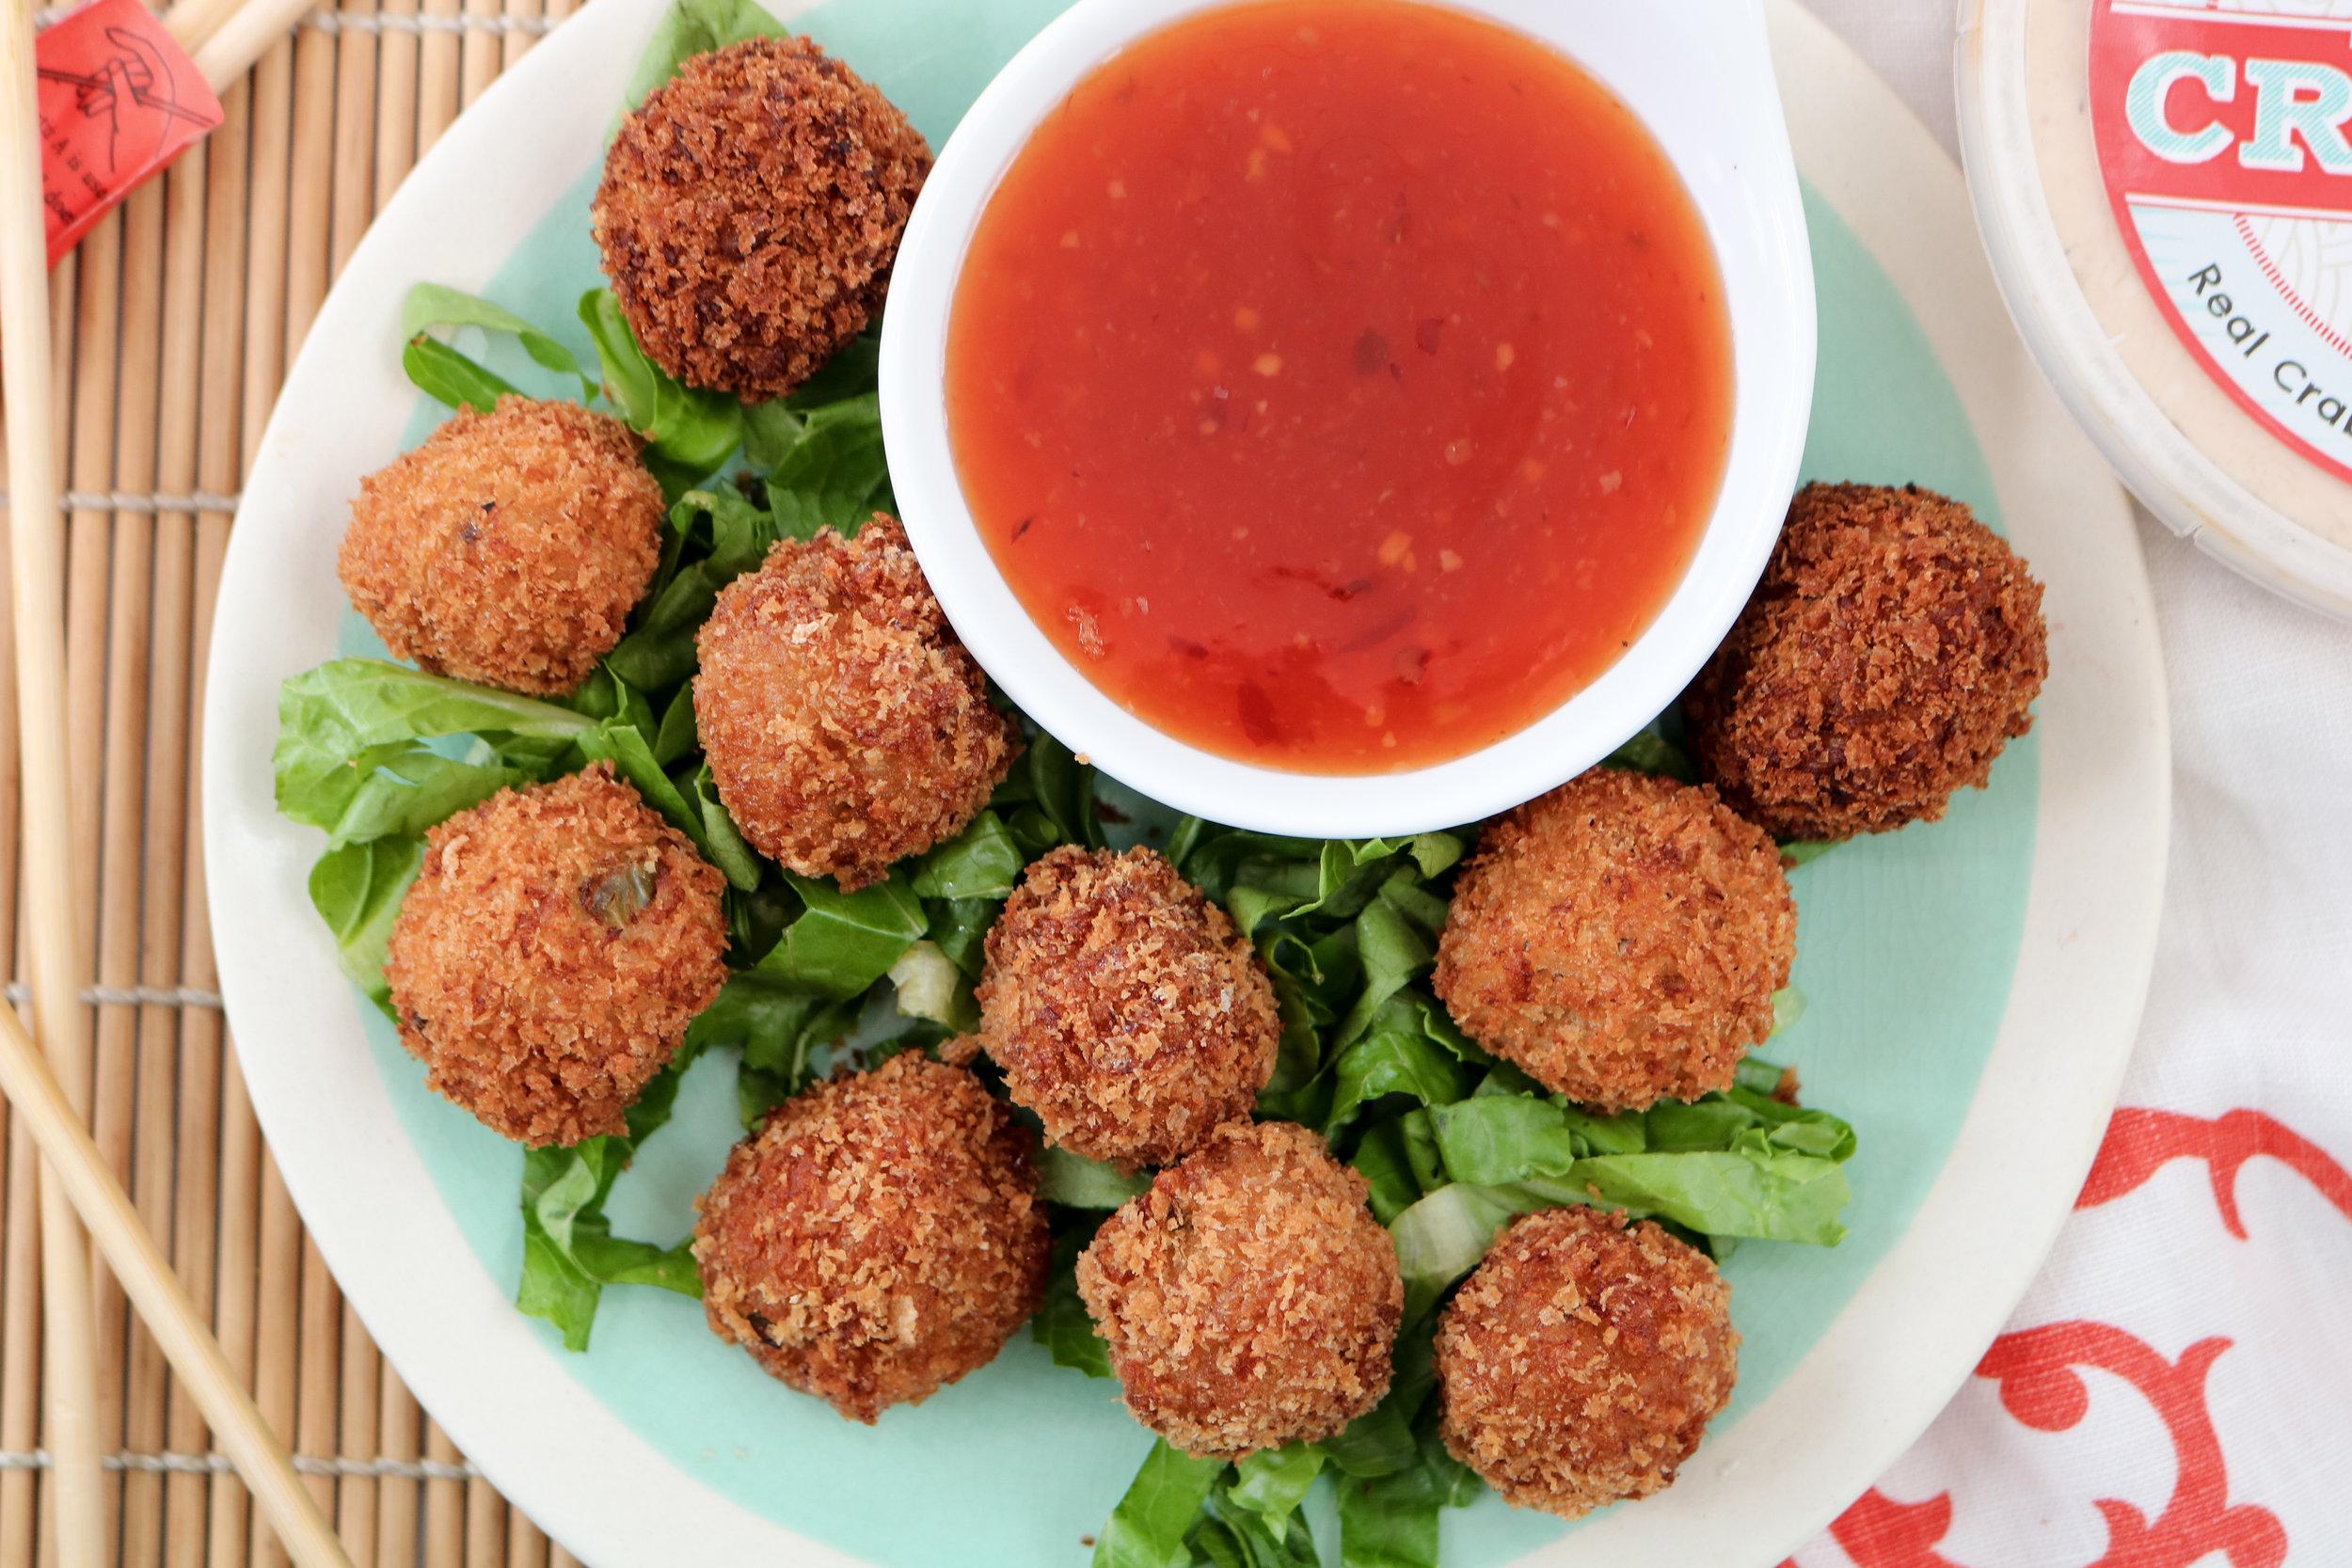 spicy-asian-crab-balls-sweet-chili-sauce-presentation.jpg